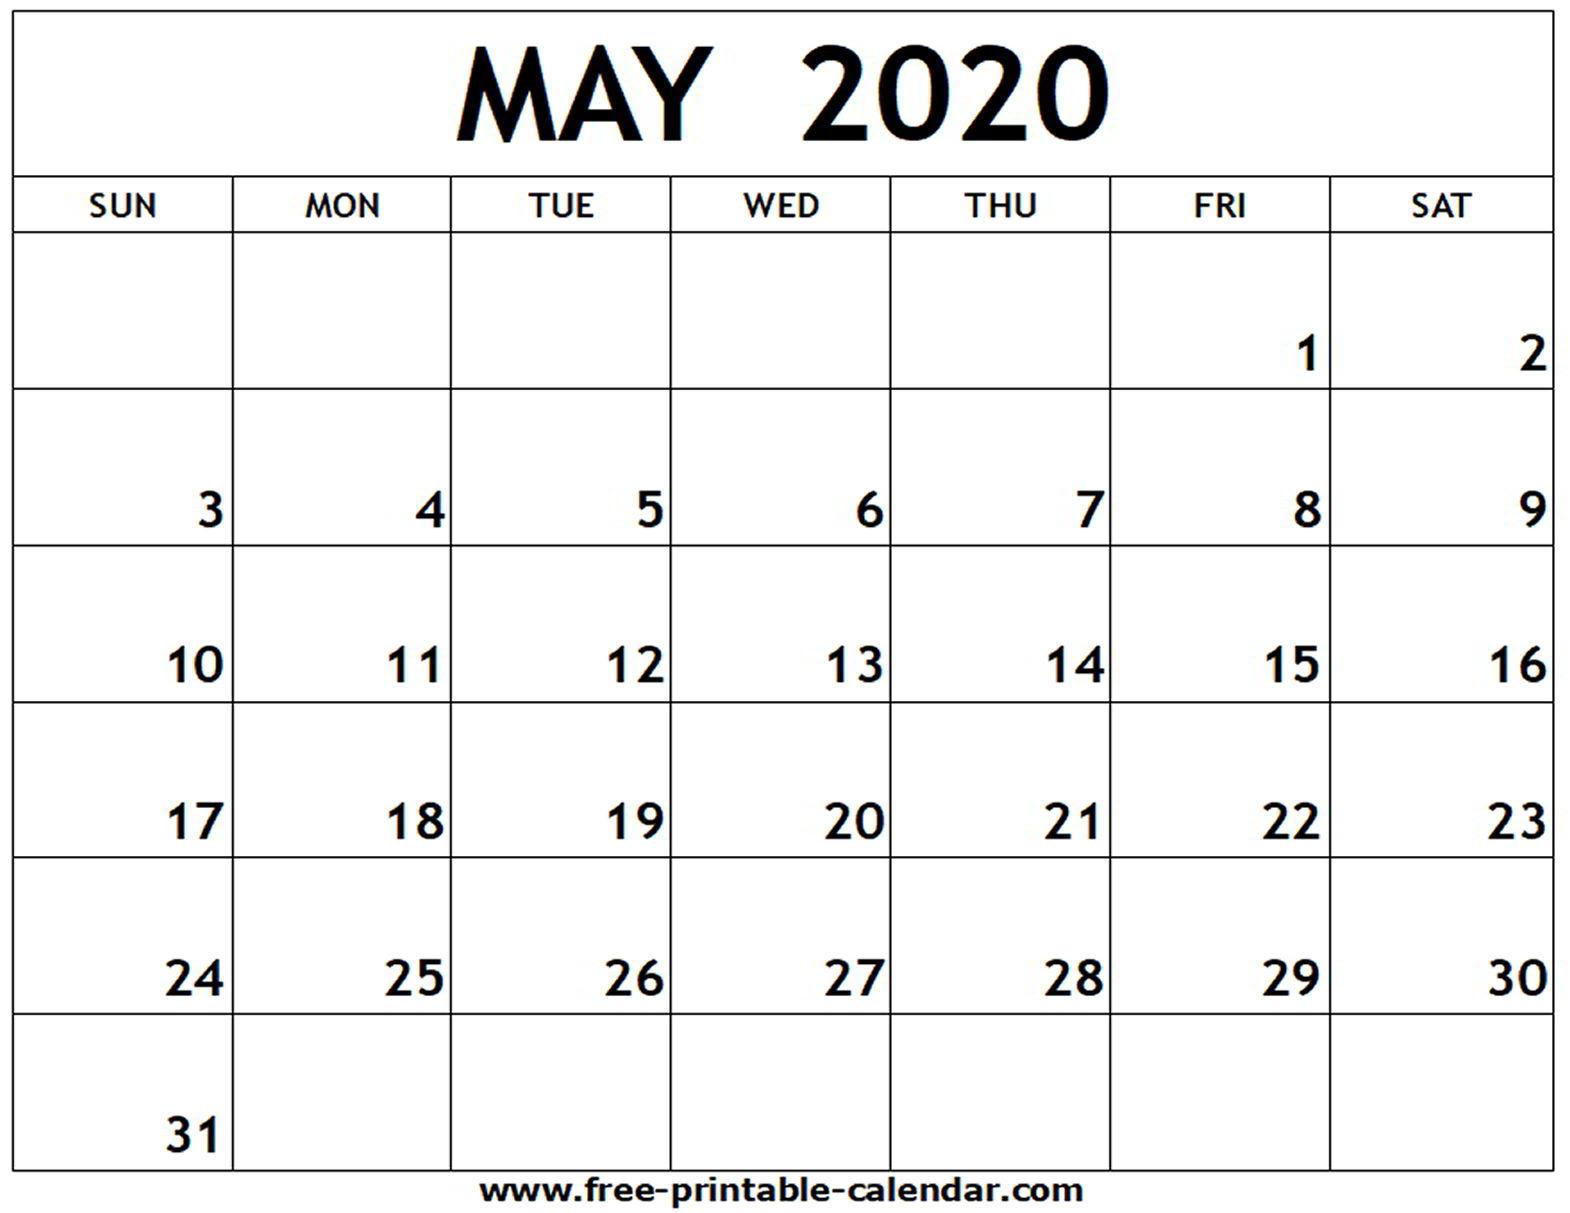 Print May Calendar 2020 - Wpa.wpart.co